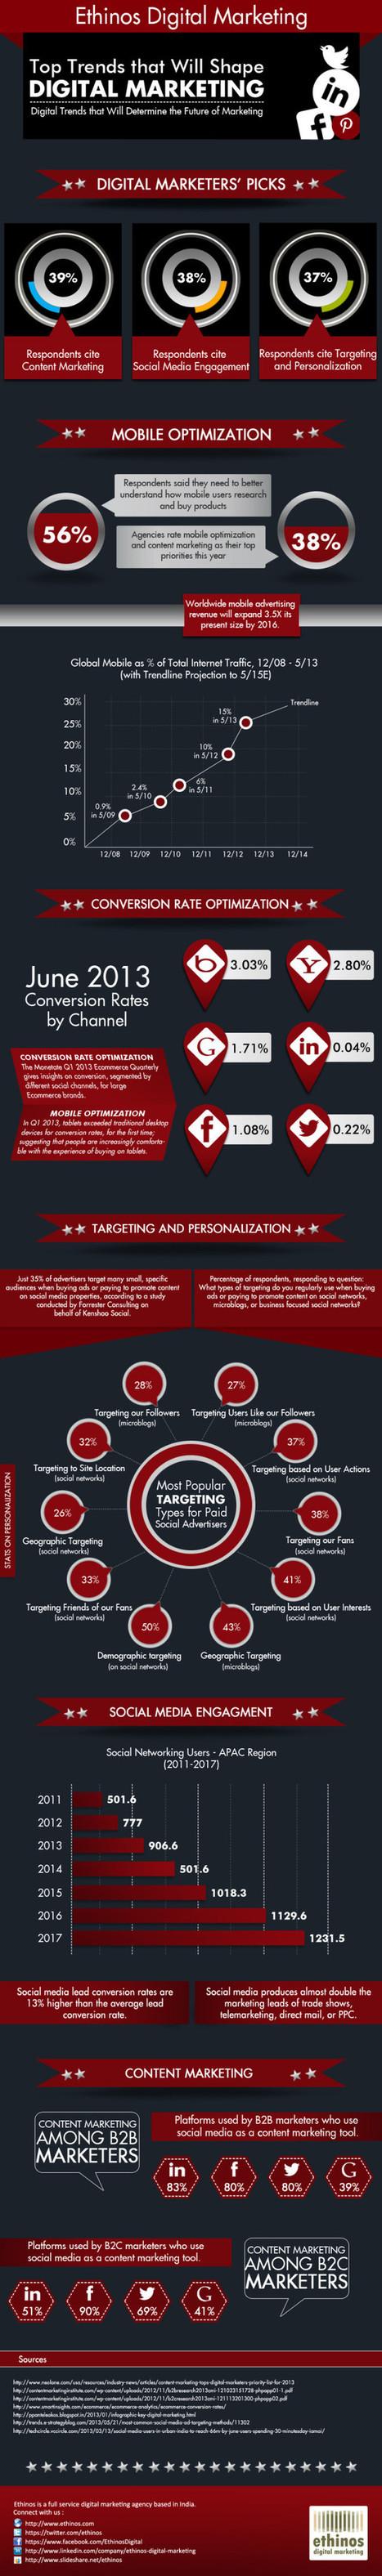 Infographic: Top Trends That Will Shape Digital Marketing - Marketing Technology Blog   #TheMarketingTechAlert   Statistics   Scoop.it